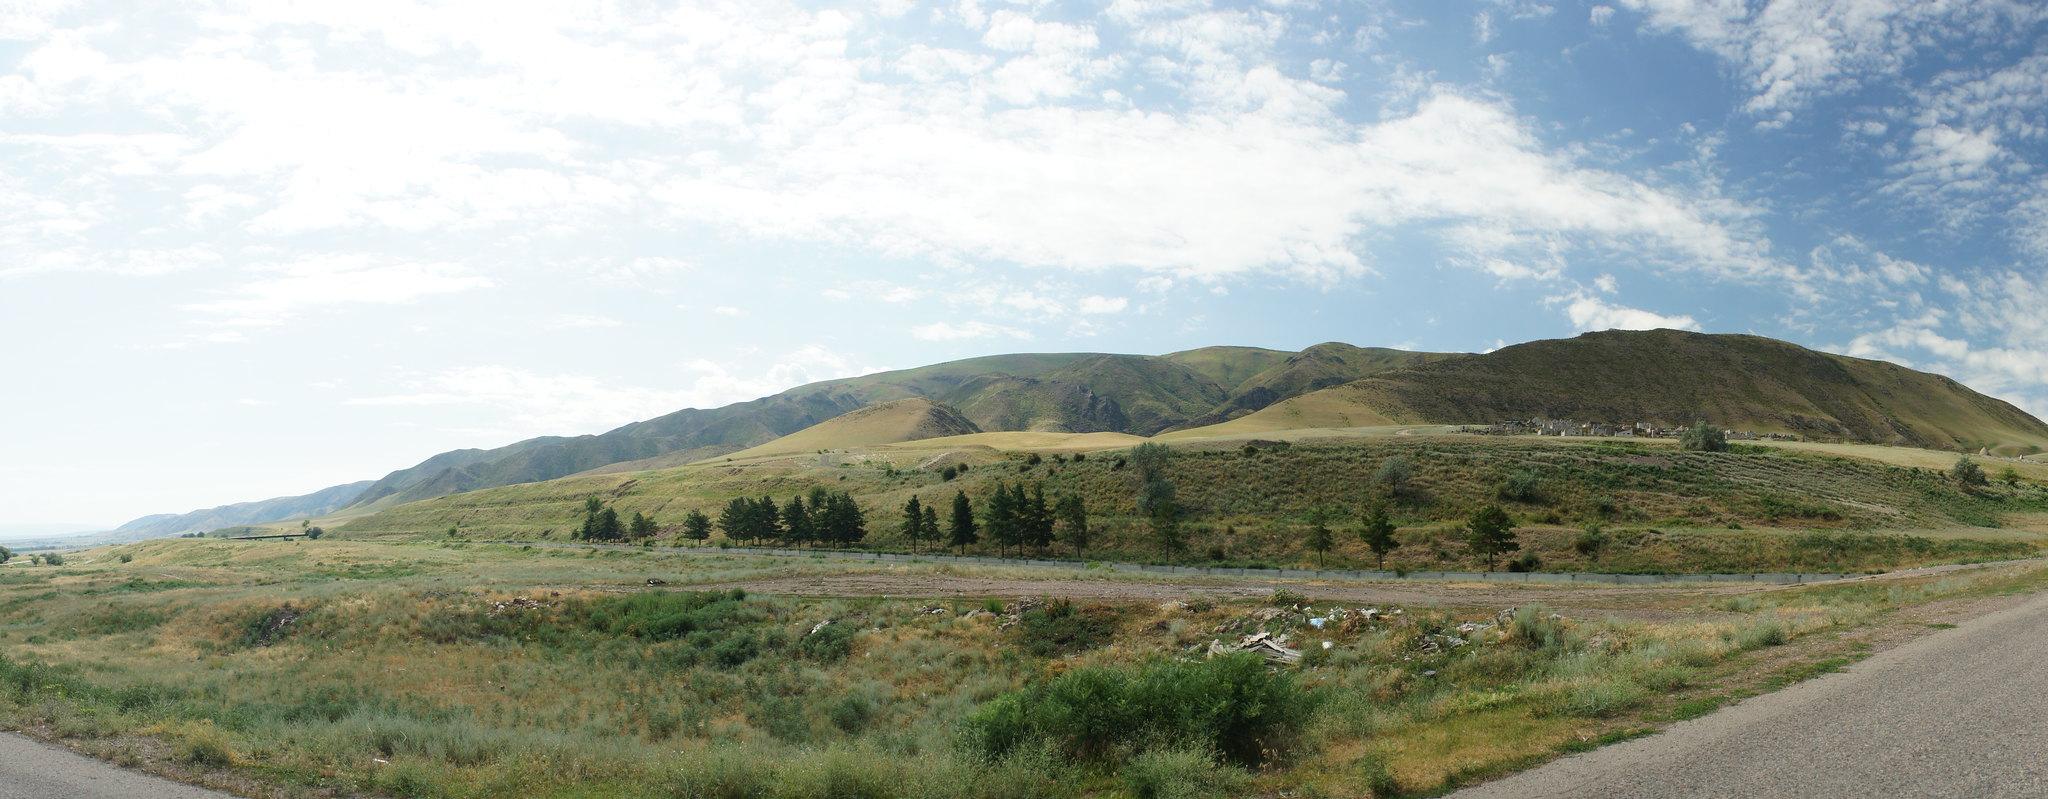 Kazakhstan: Korgos-Almaty